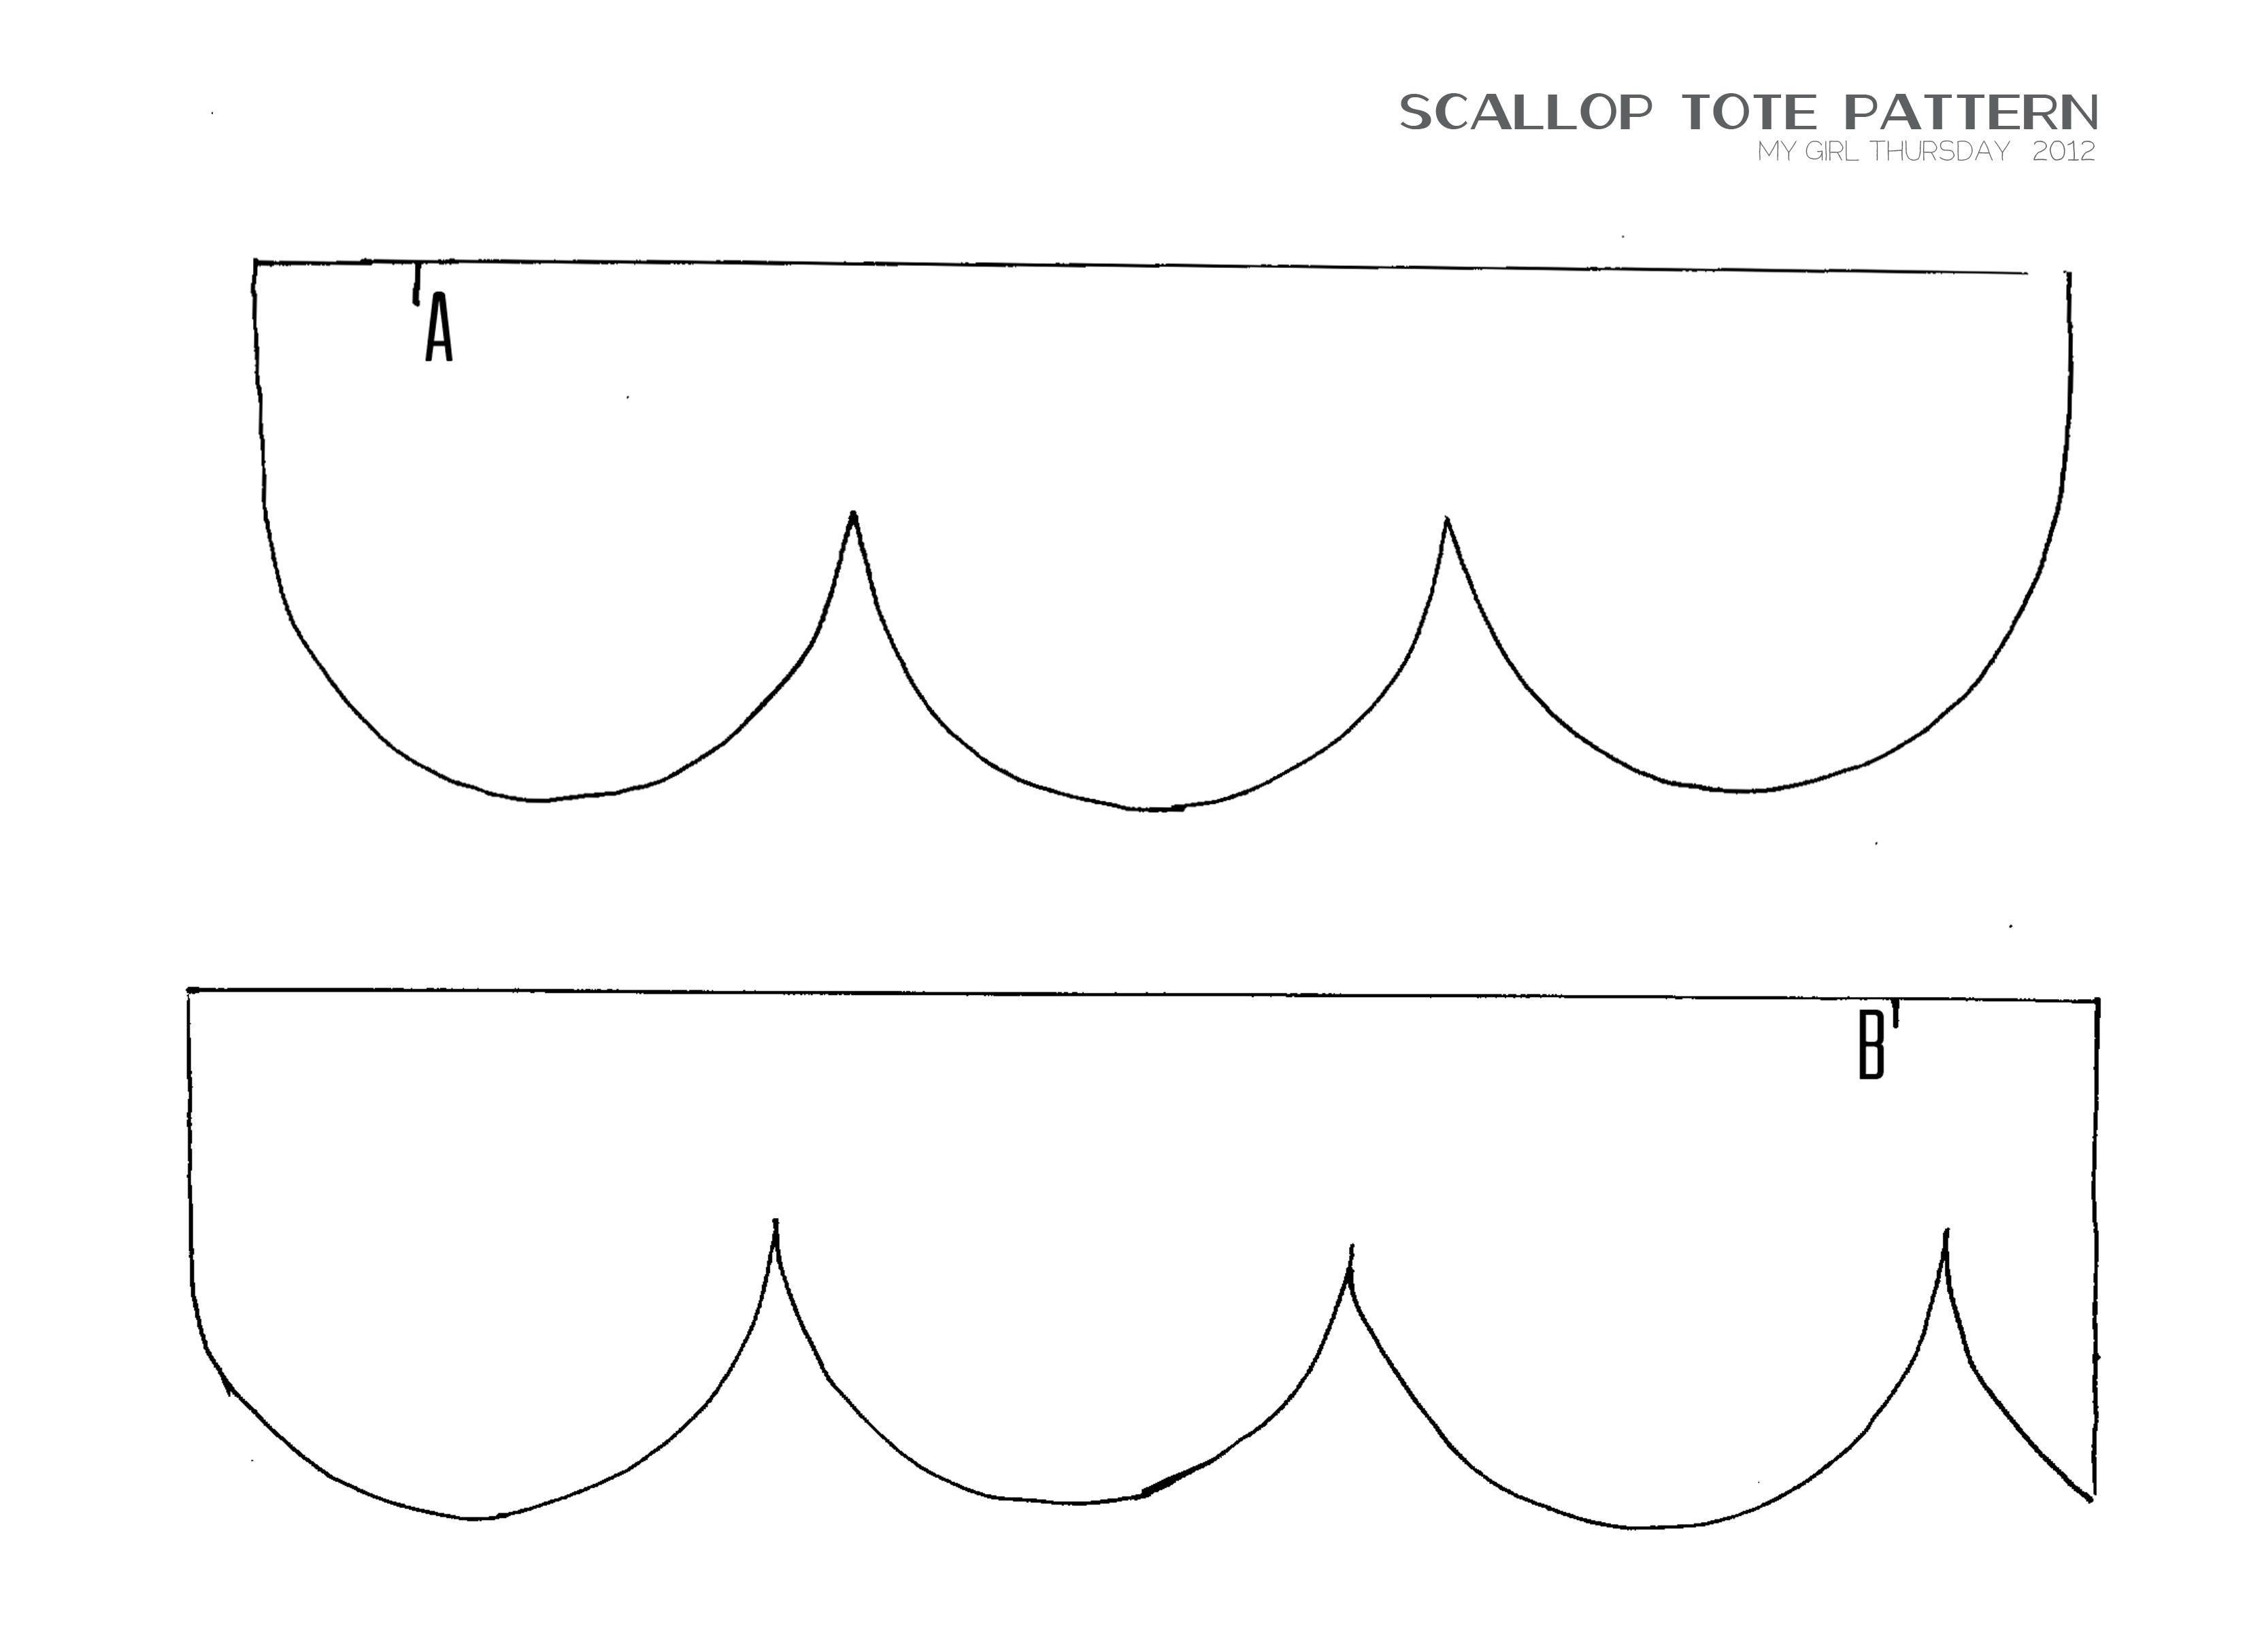 Scallop design template vatozozdevelopment scallop design template maxwellsz